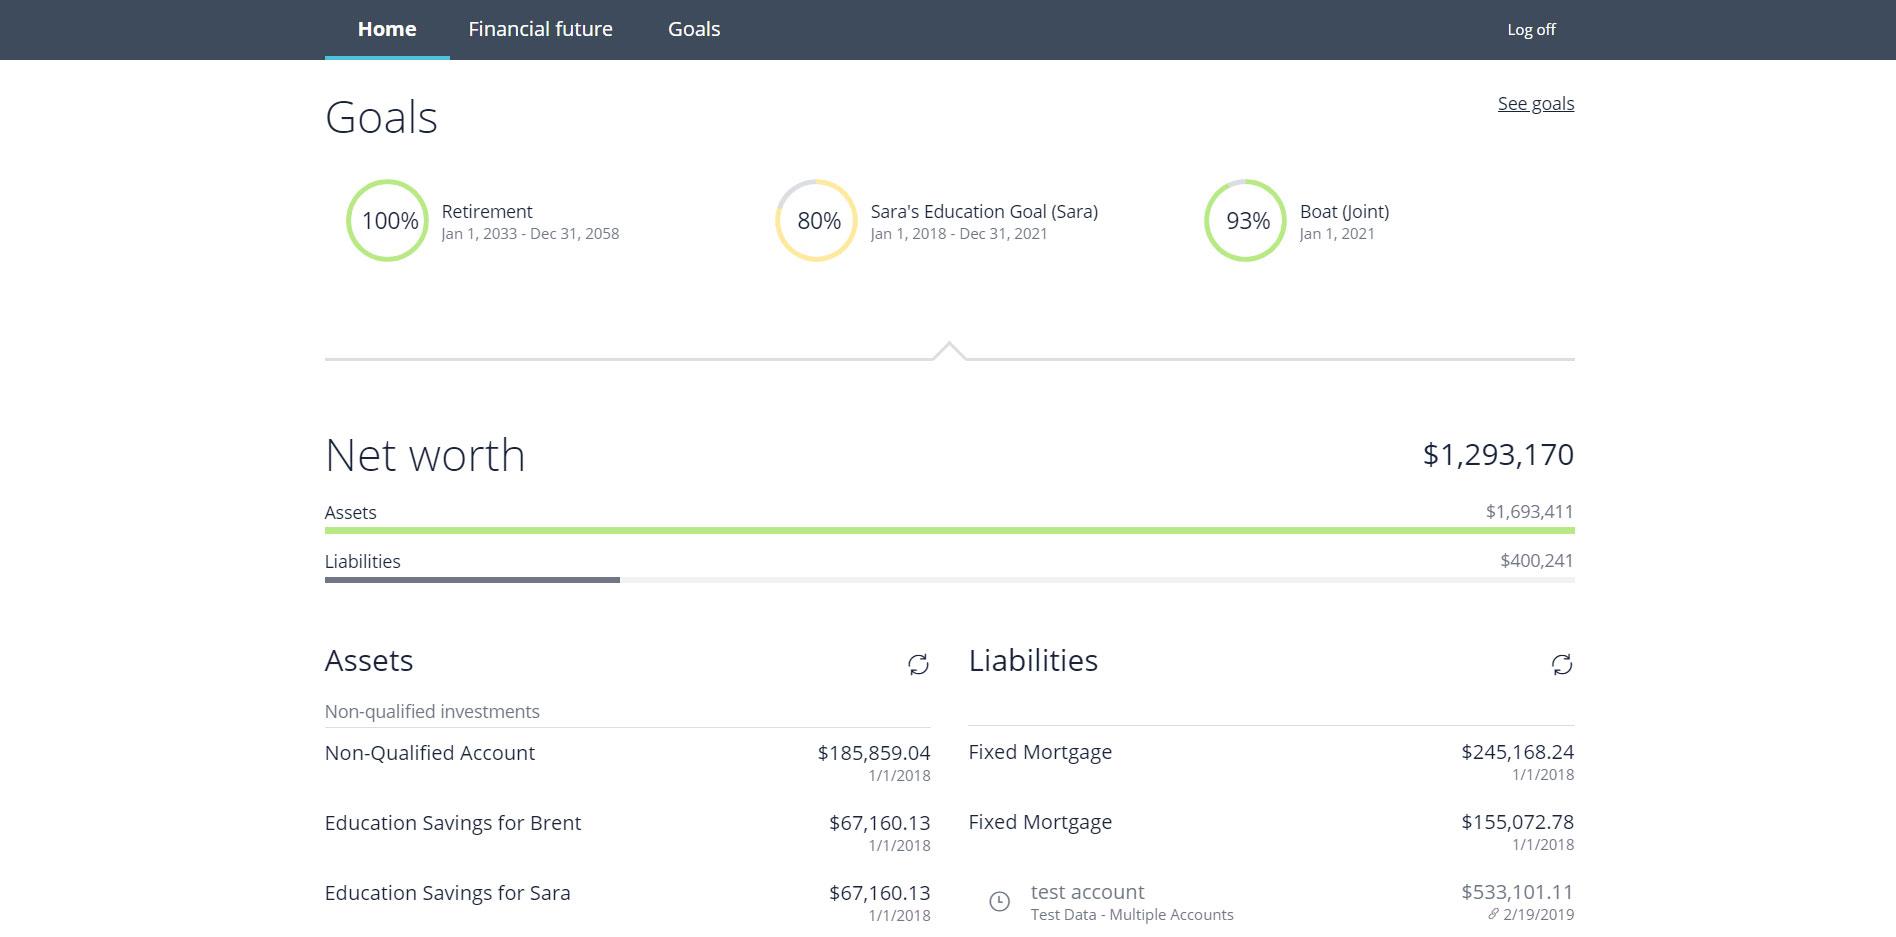 NaviPlan client portal home screen